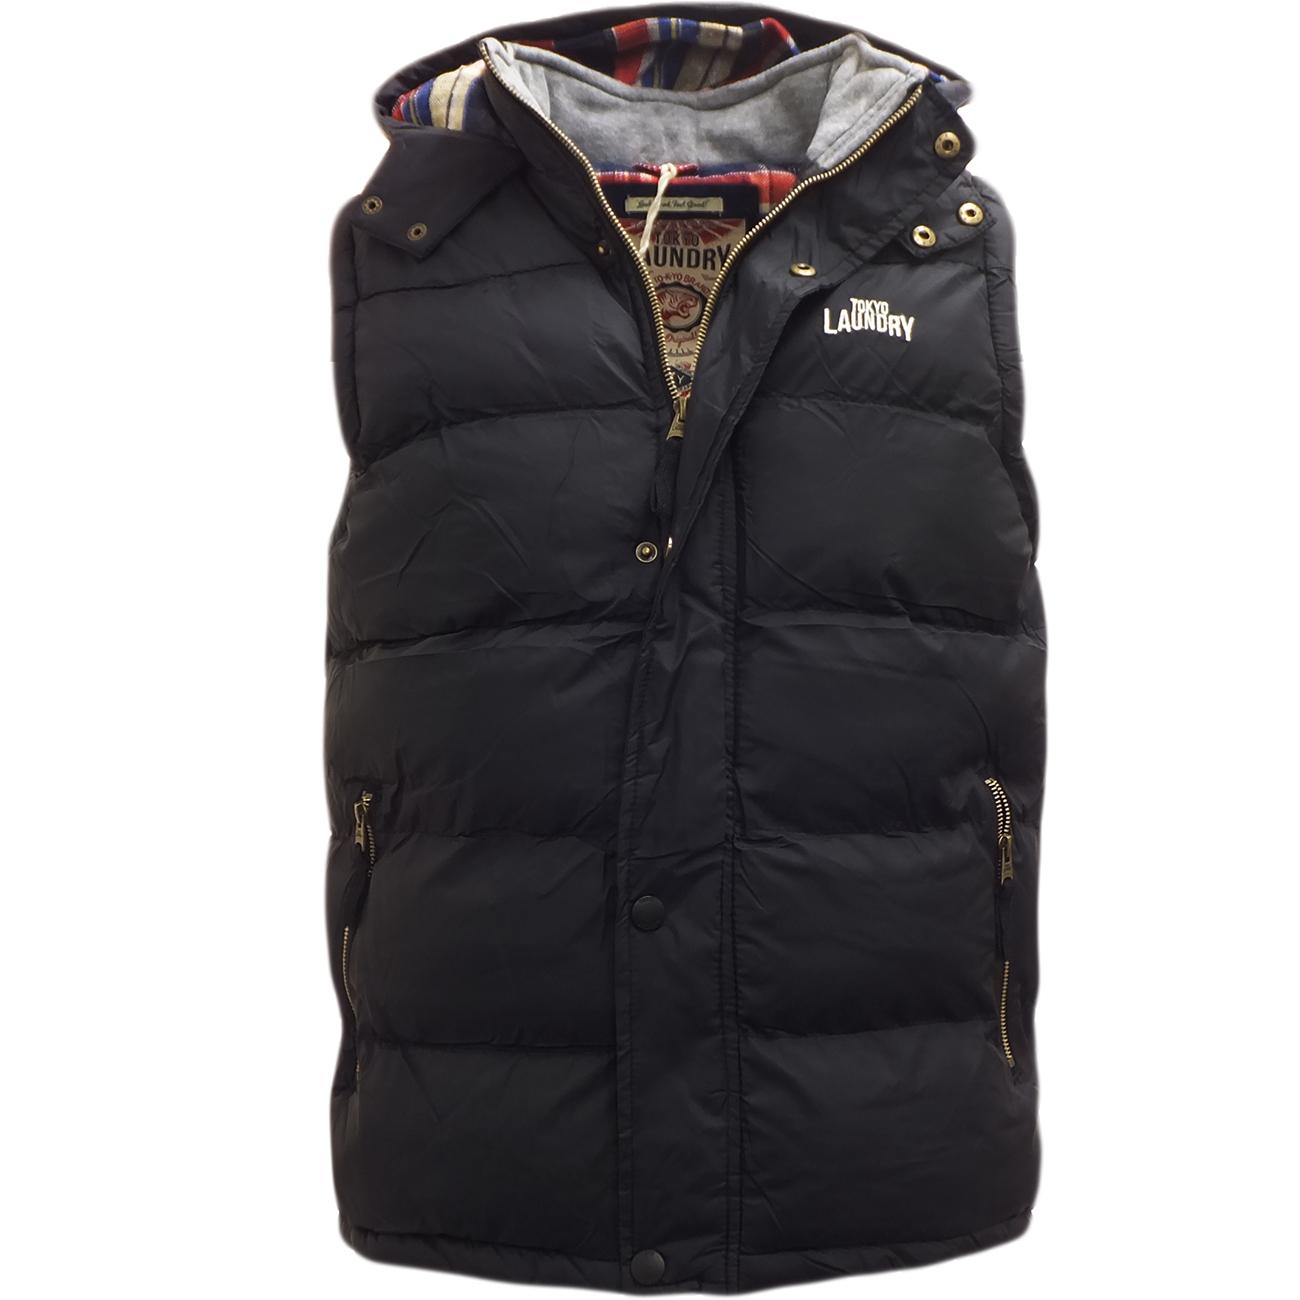 mens gilet tokyo laundry body warmer sleeveless coat. Black Bedroom Furniture Sets. Home Design Ideas